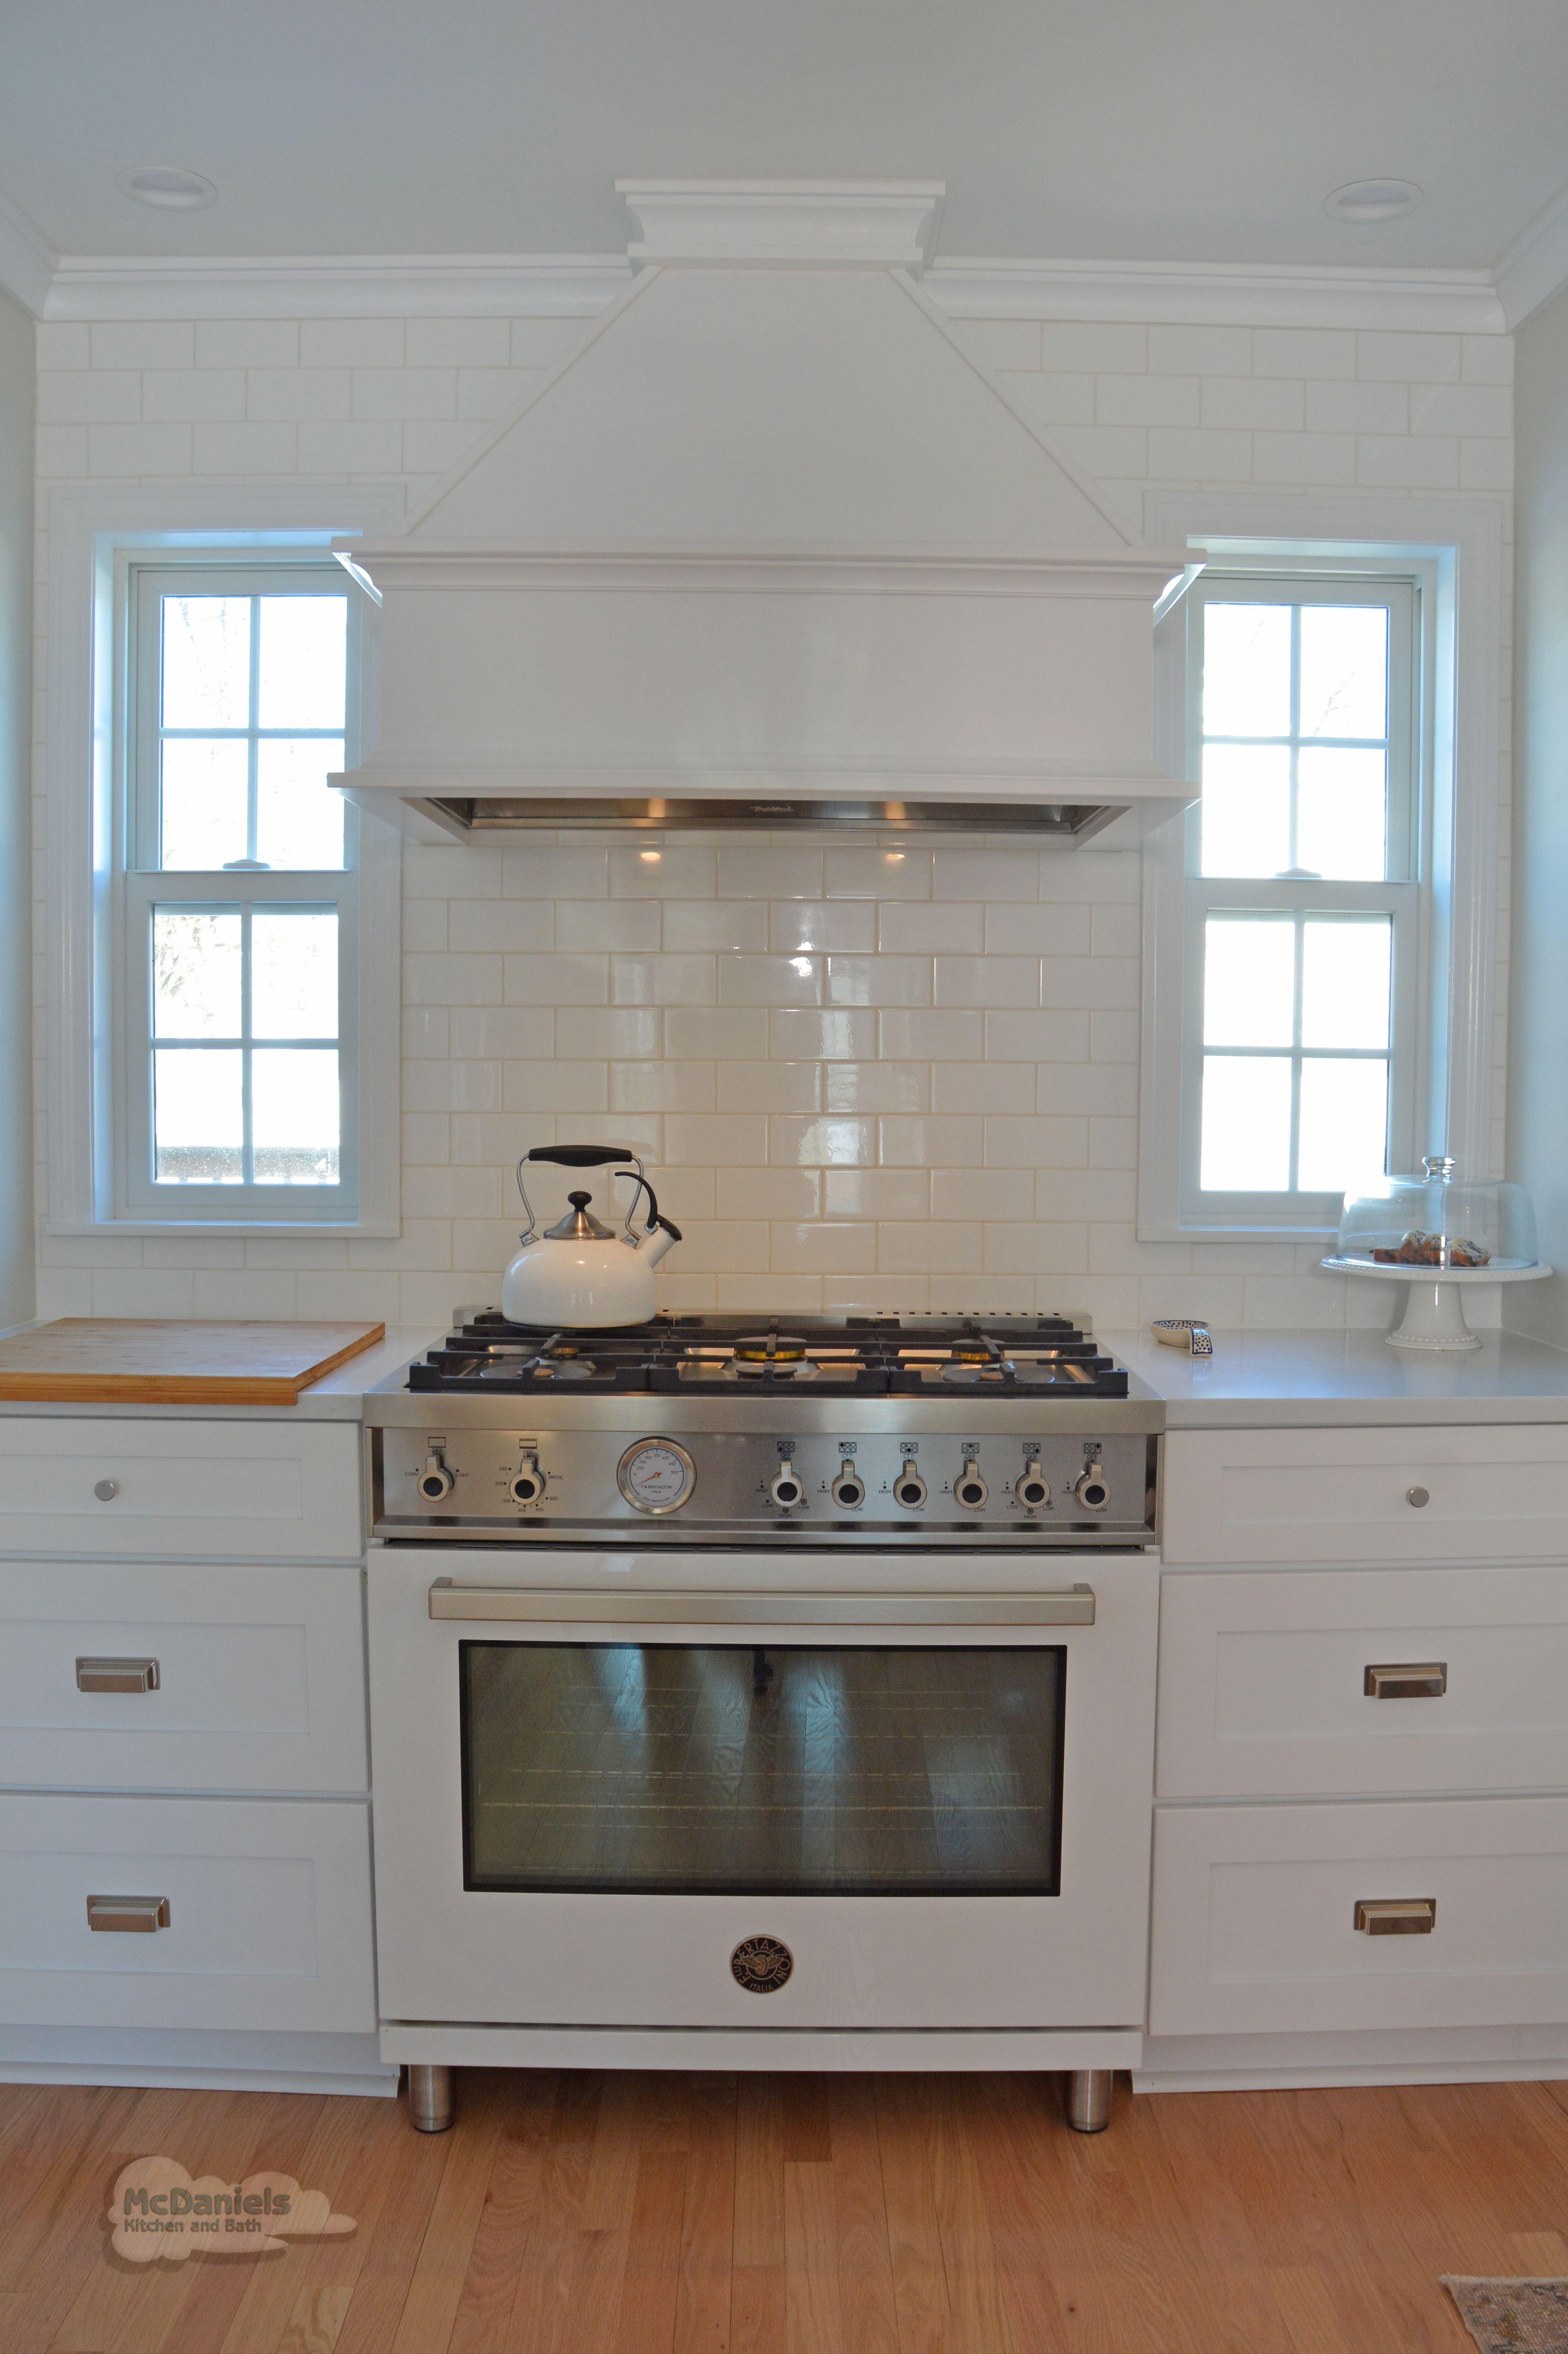 Local Kitchen & Bathroom Design & Remodeling Services ...